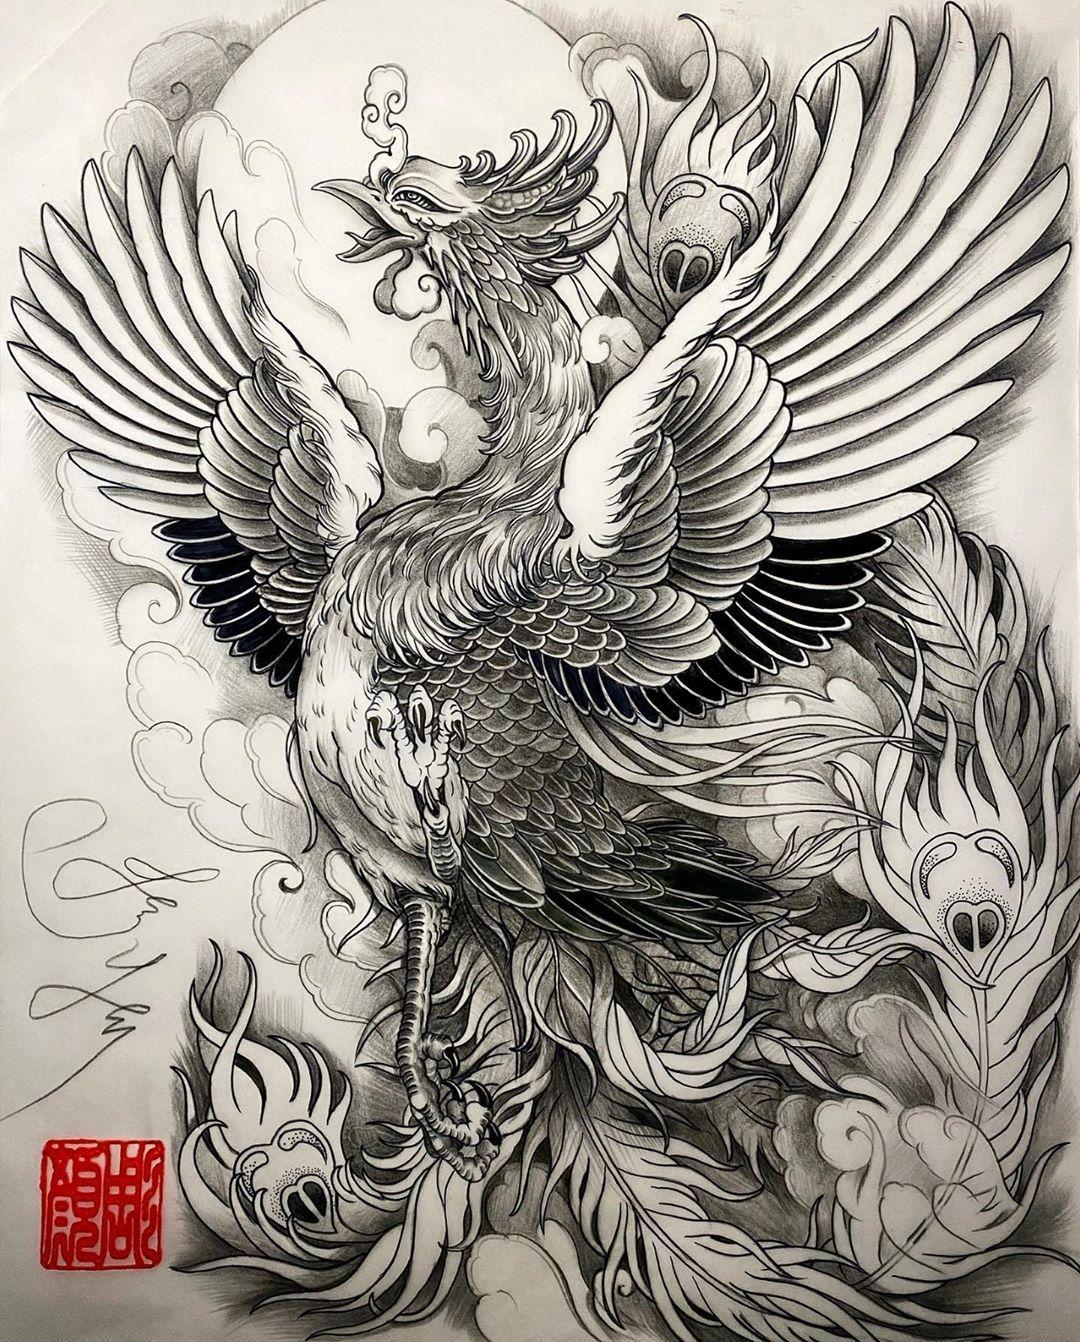 Asianinkandart On Instagram Phoenix Artwork By Artist Jessyentattoo Jessyendotcom Asianinkandart In 2020 Phoenix Artwork Phoenix Design Phoenix Tattoo